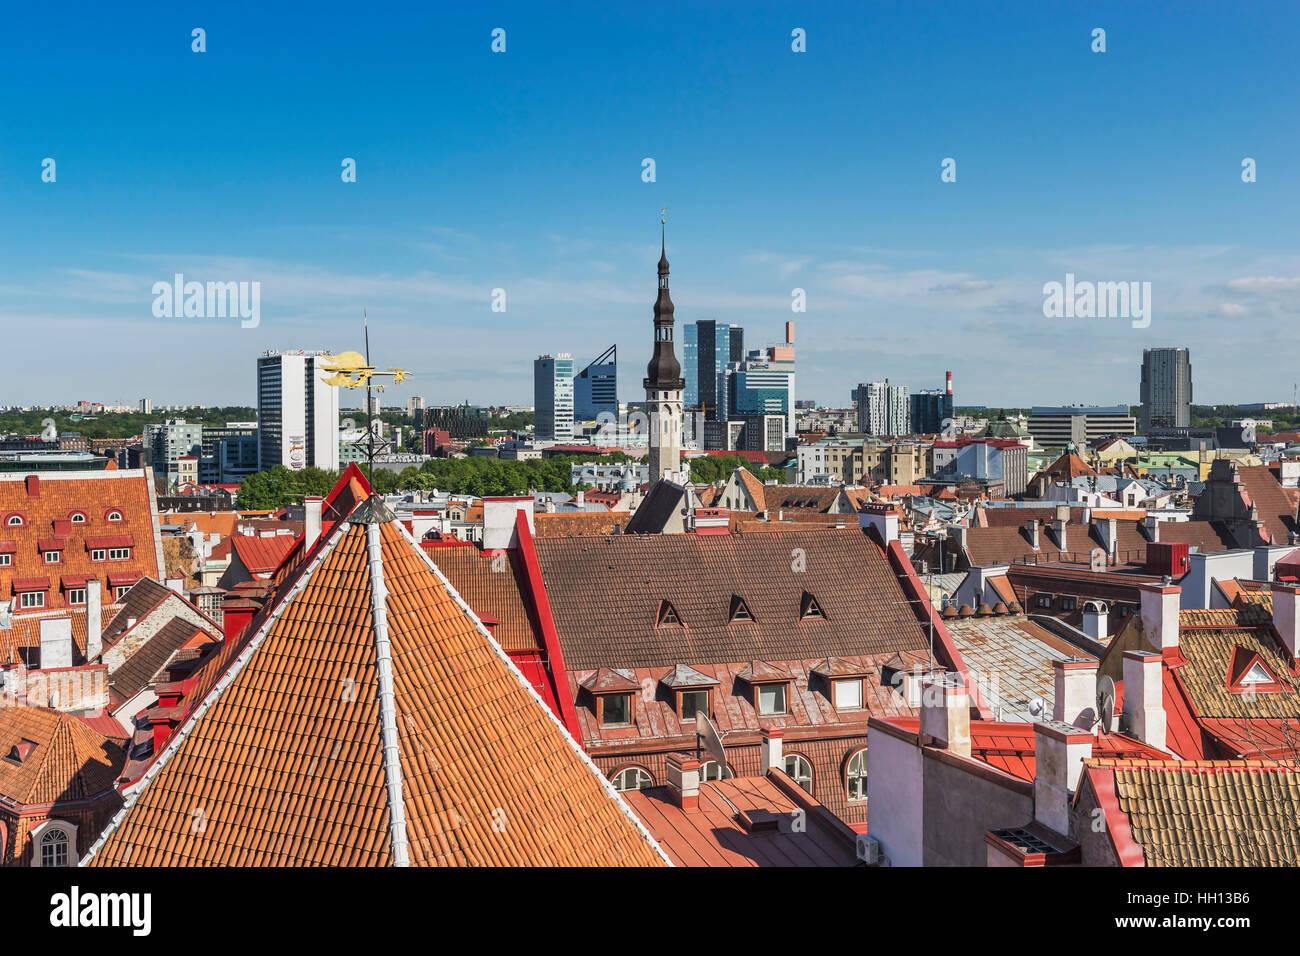 View over Tallinn to the modern houses in the new town area, Tallinn, Estonia, Baltic States, Europe - Stock Image